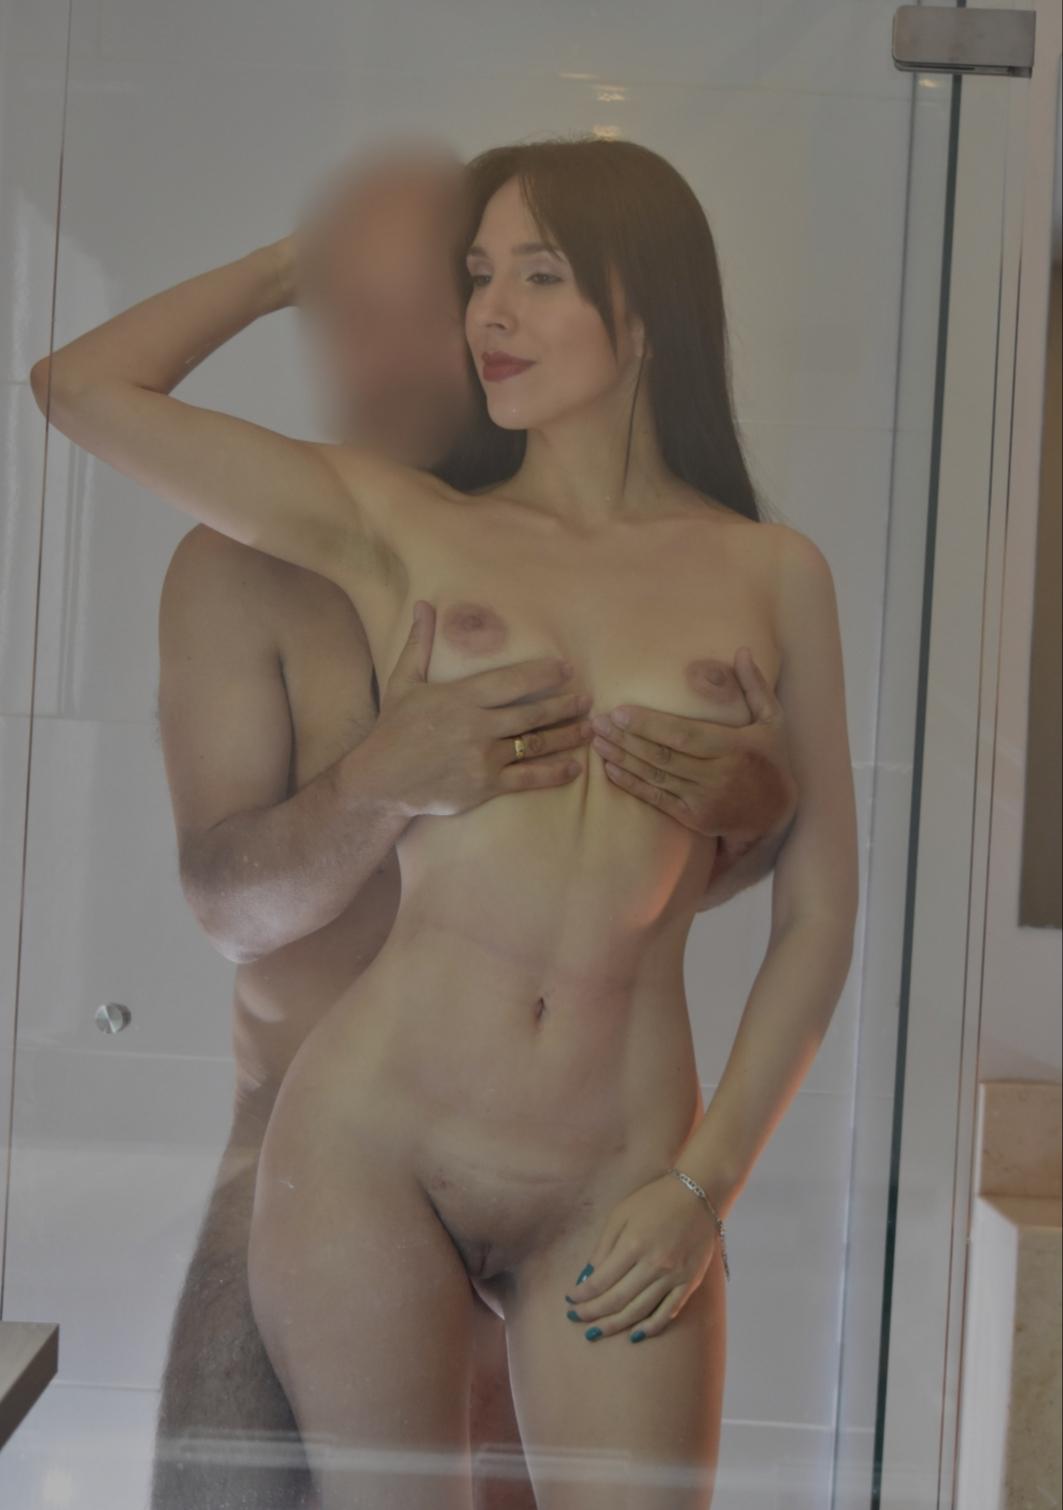 https://i5.imageban.ru/out/2020/10/17/86a0445a6cde6bf27c0b85fe75441d41.jpg